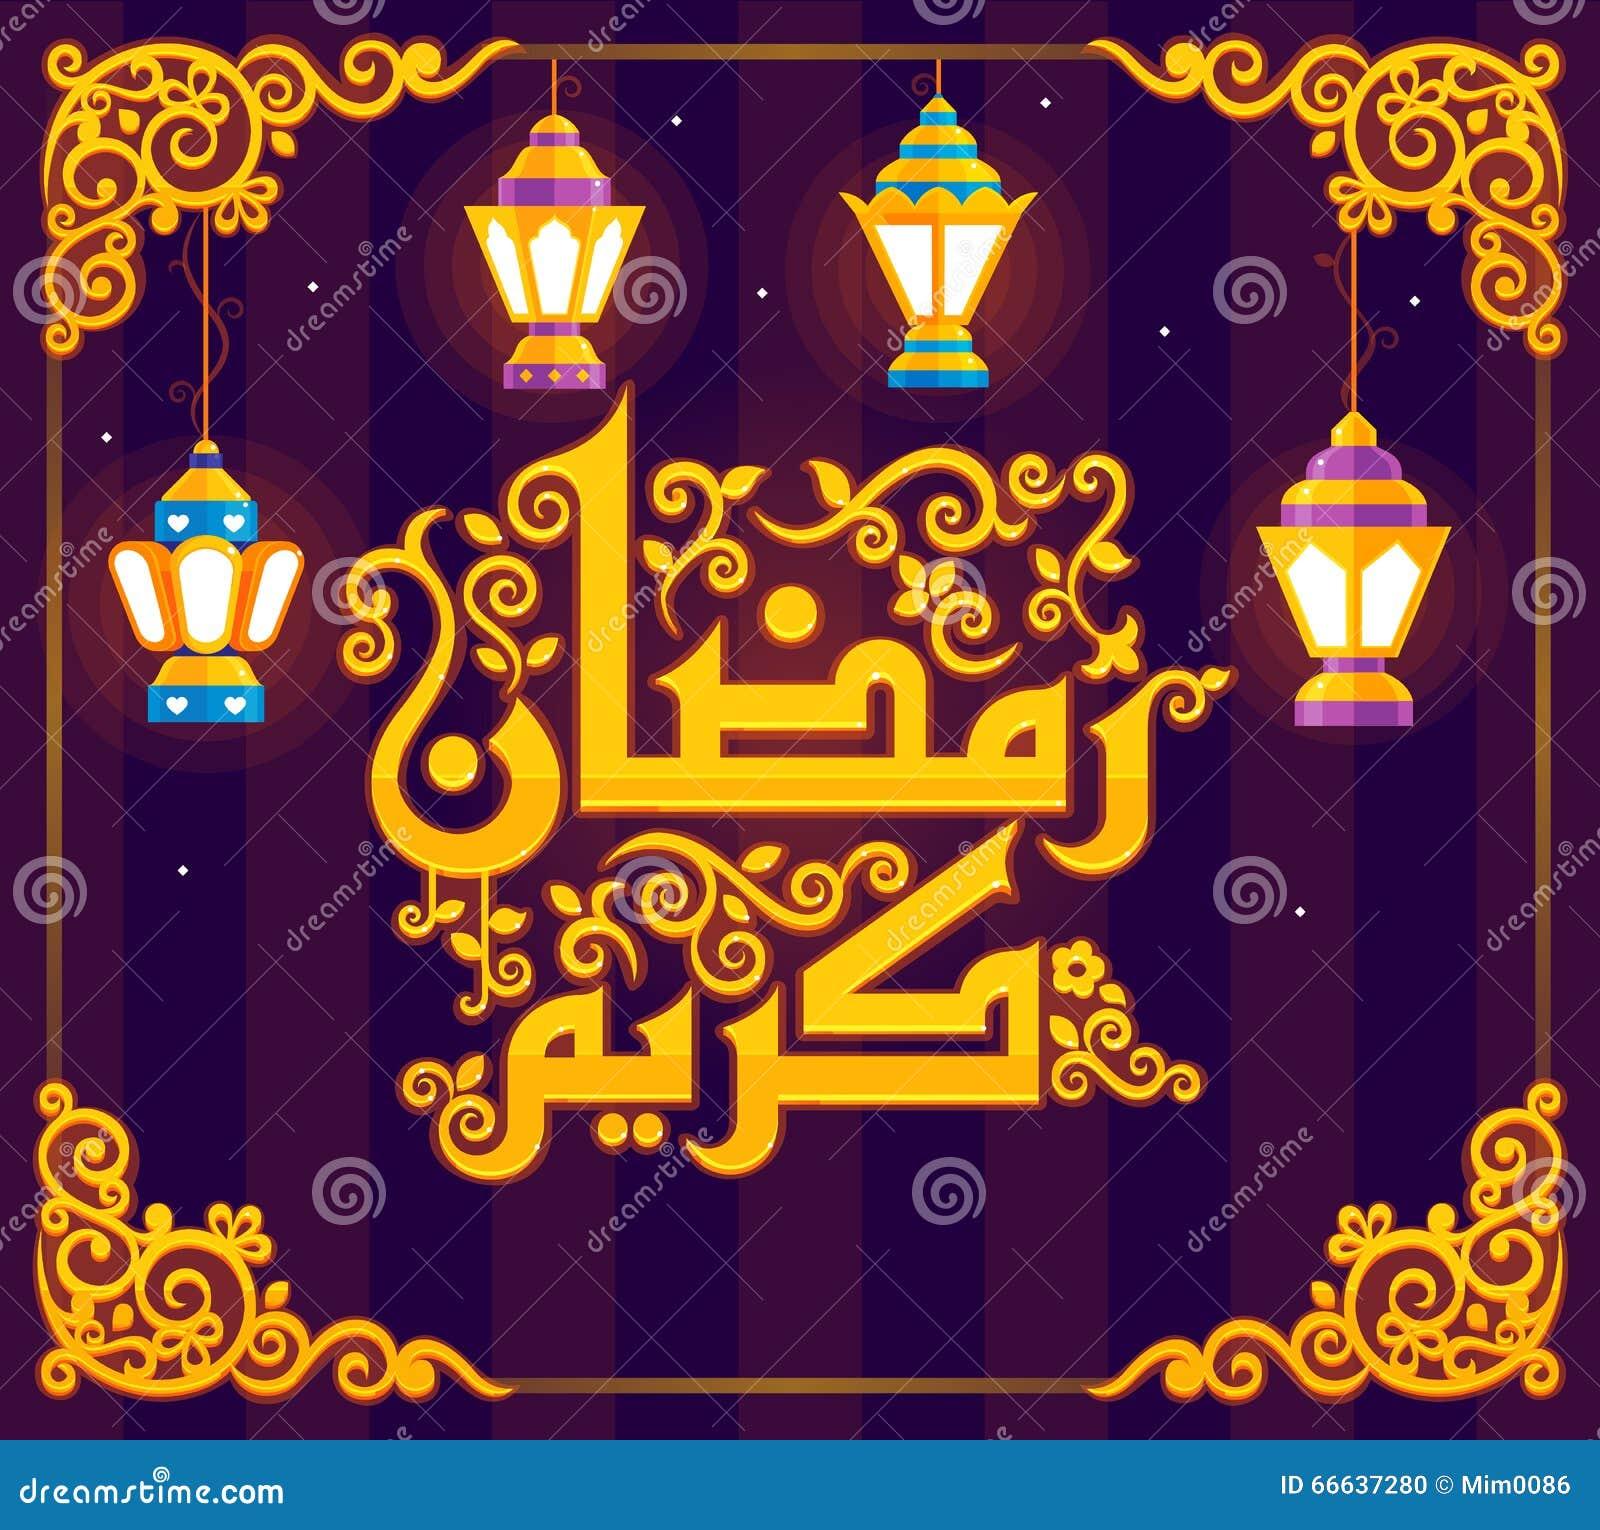 Translation Happy Ramadan Is The Ninth Month Of Muslim Calendar Text Written In Arabic Greeting Card Kareem